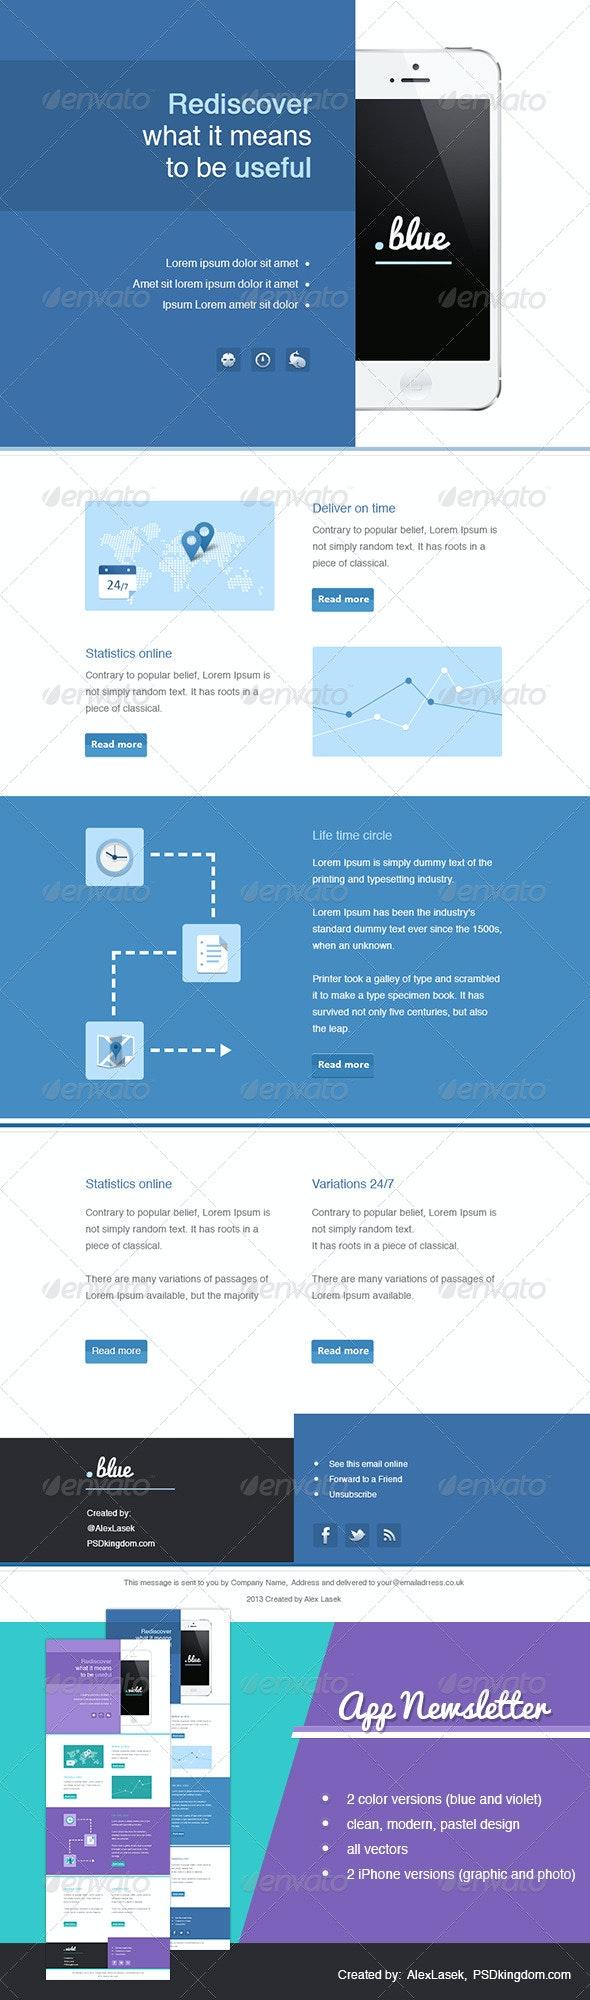 App eNewsletter Templates - Blue & Violet - E-newsletters Web Elements